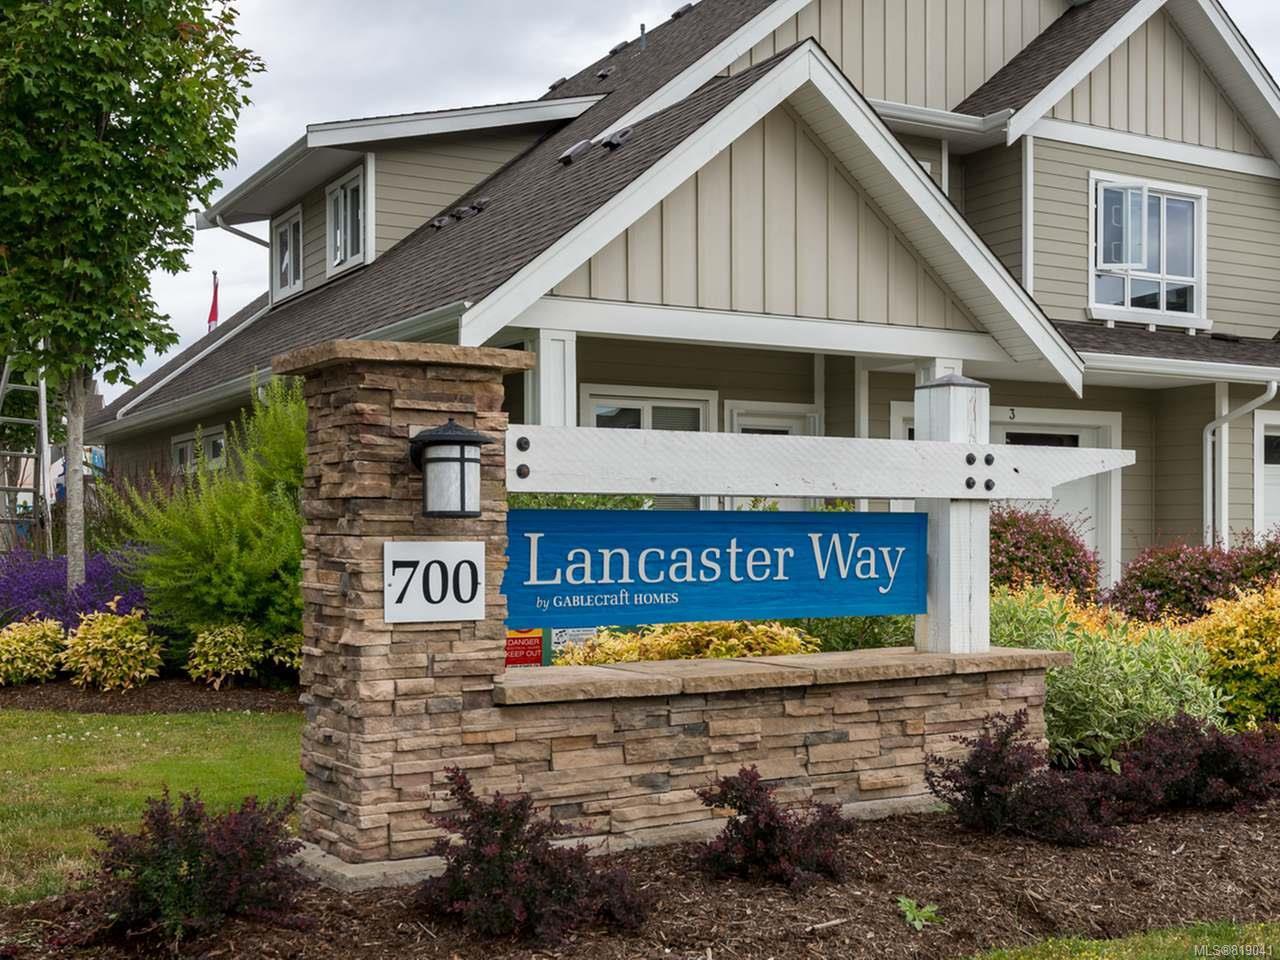 Main Photo: 38 700 LANCASTER Way in COMOX: CV Comox (Town of) Row/Townhouse for sale (Comox Valley)  : MLS®# 819041